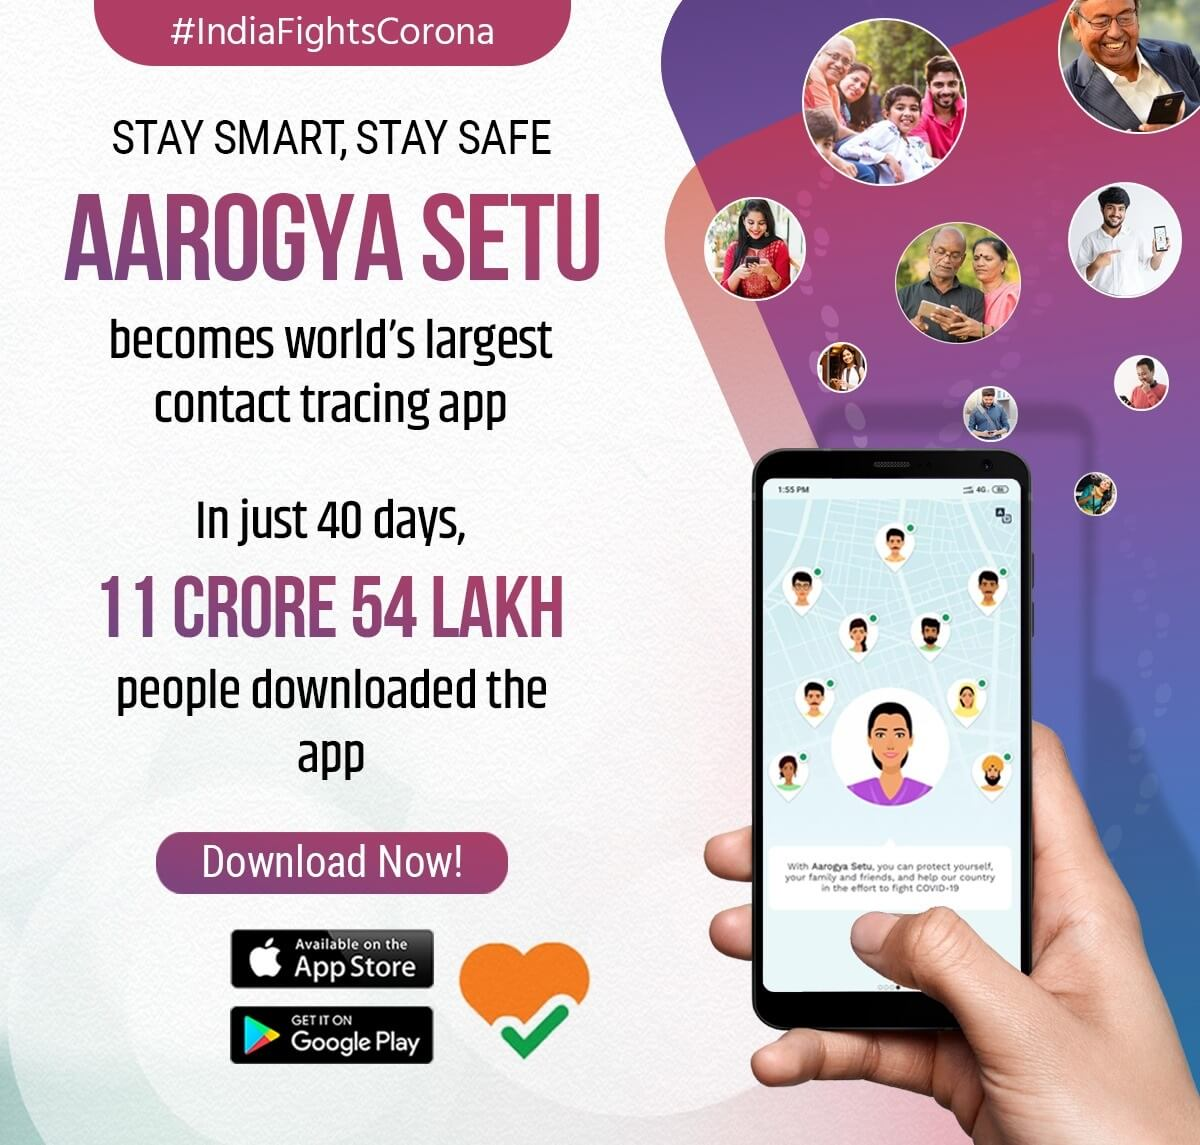 Aarogya Setu - World's Largest Contact Tracing App